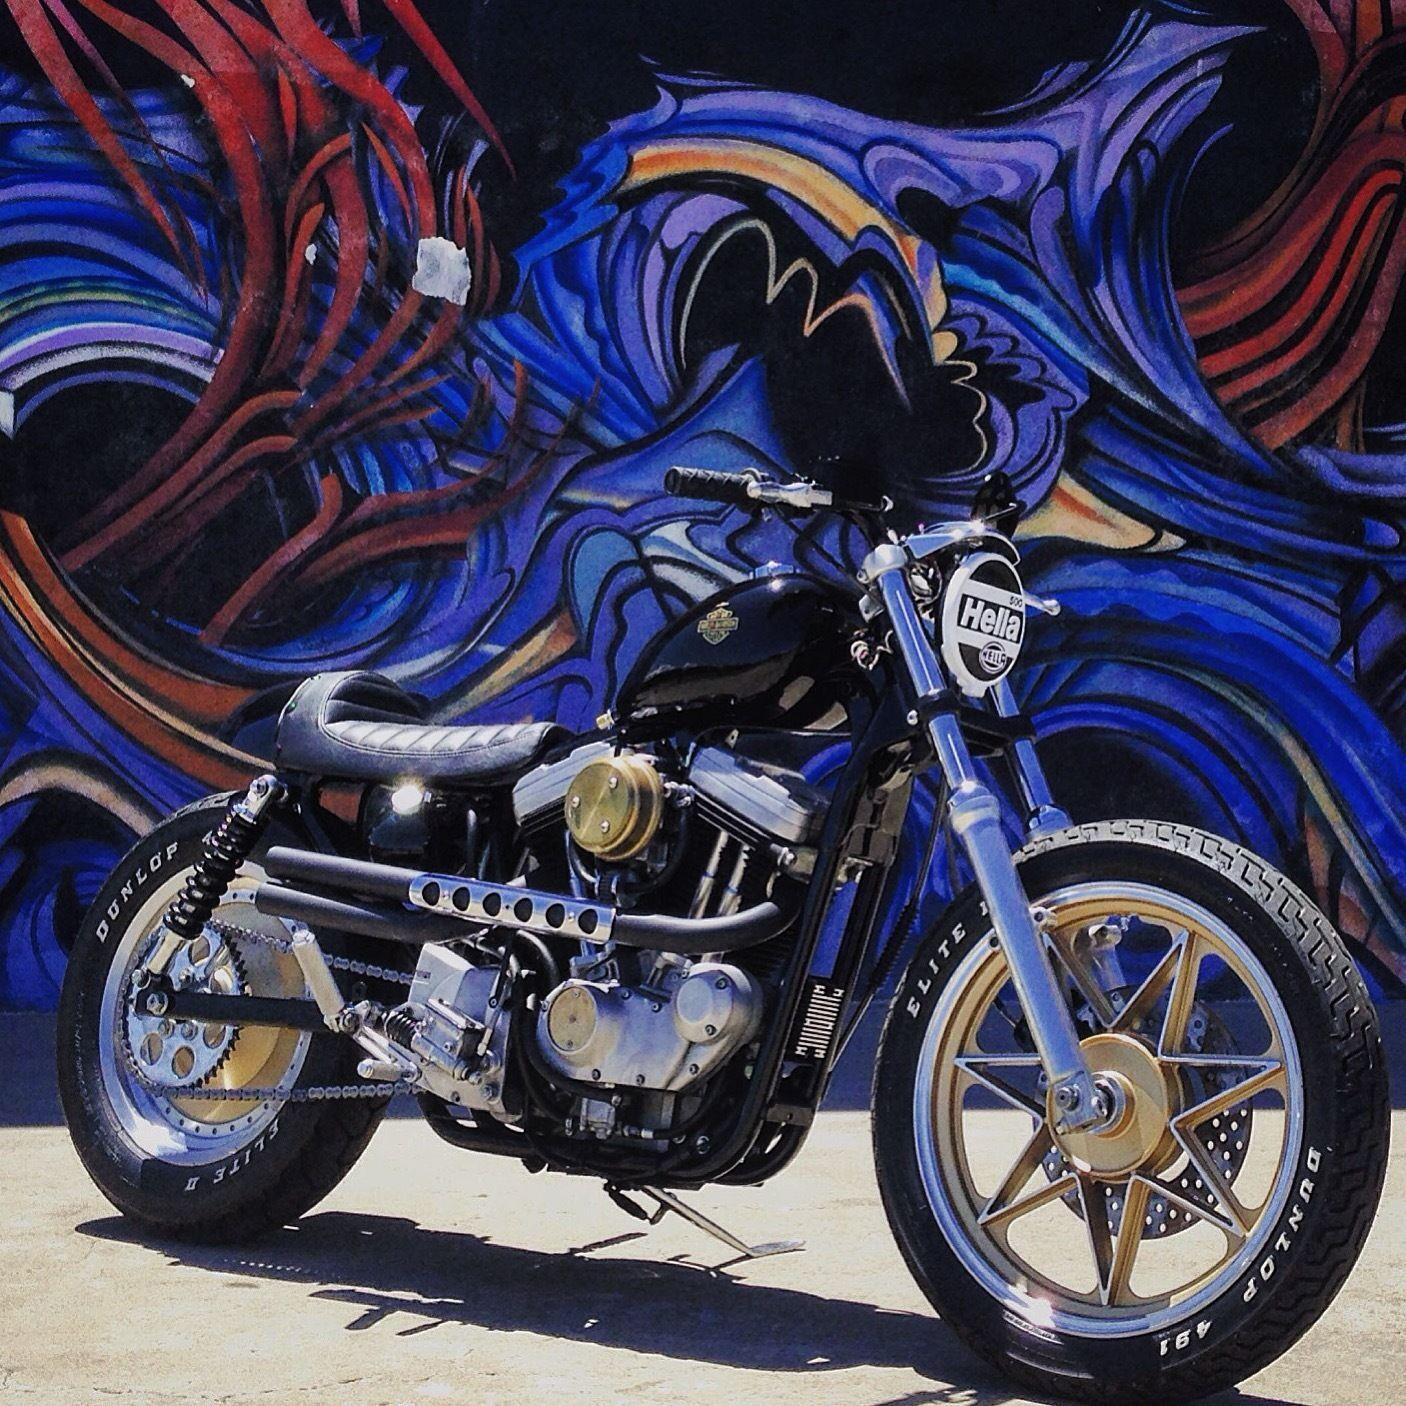 1993 Harley Davidson Sportster Street Tracker Cafe Racer